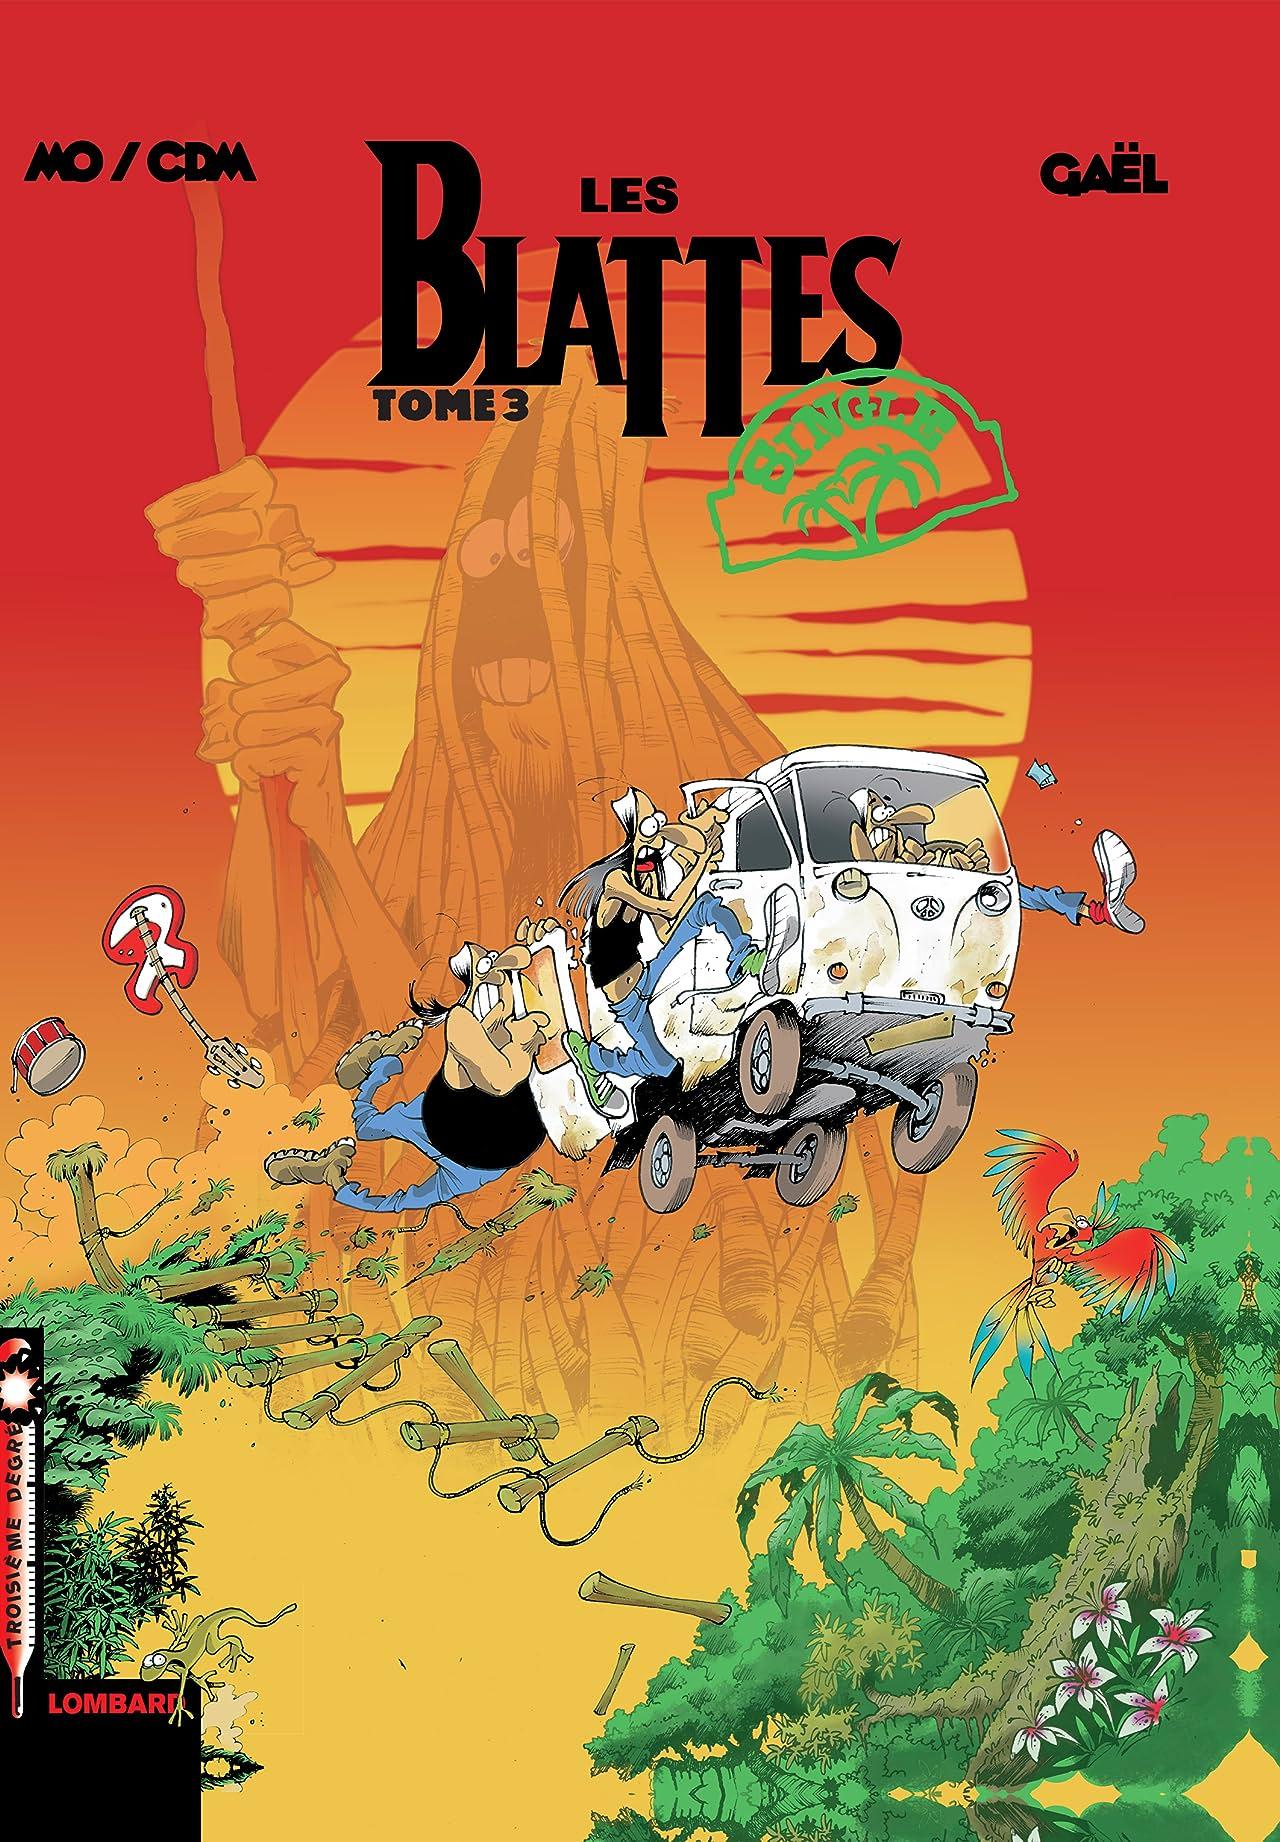 Les Blattes Vol. 3: Single